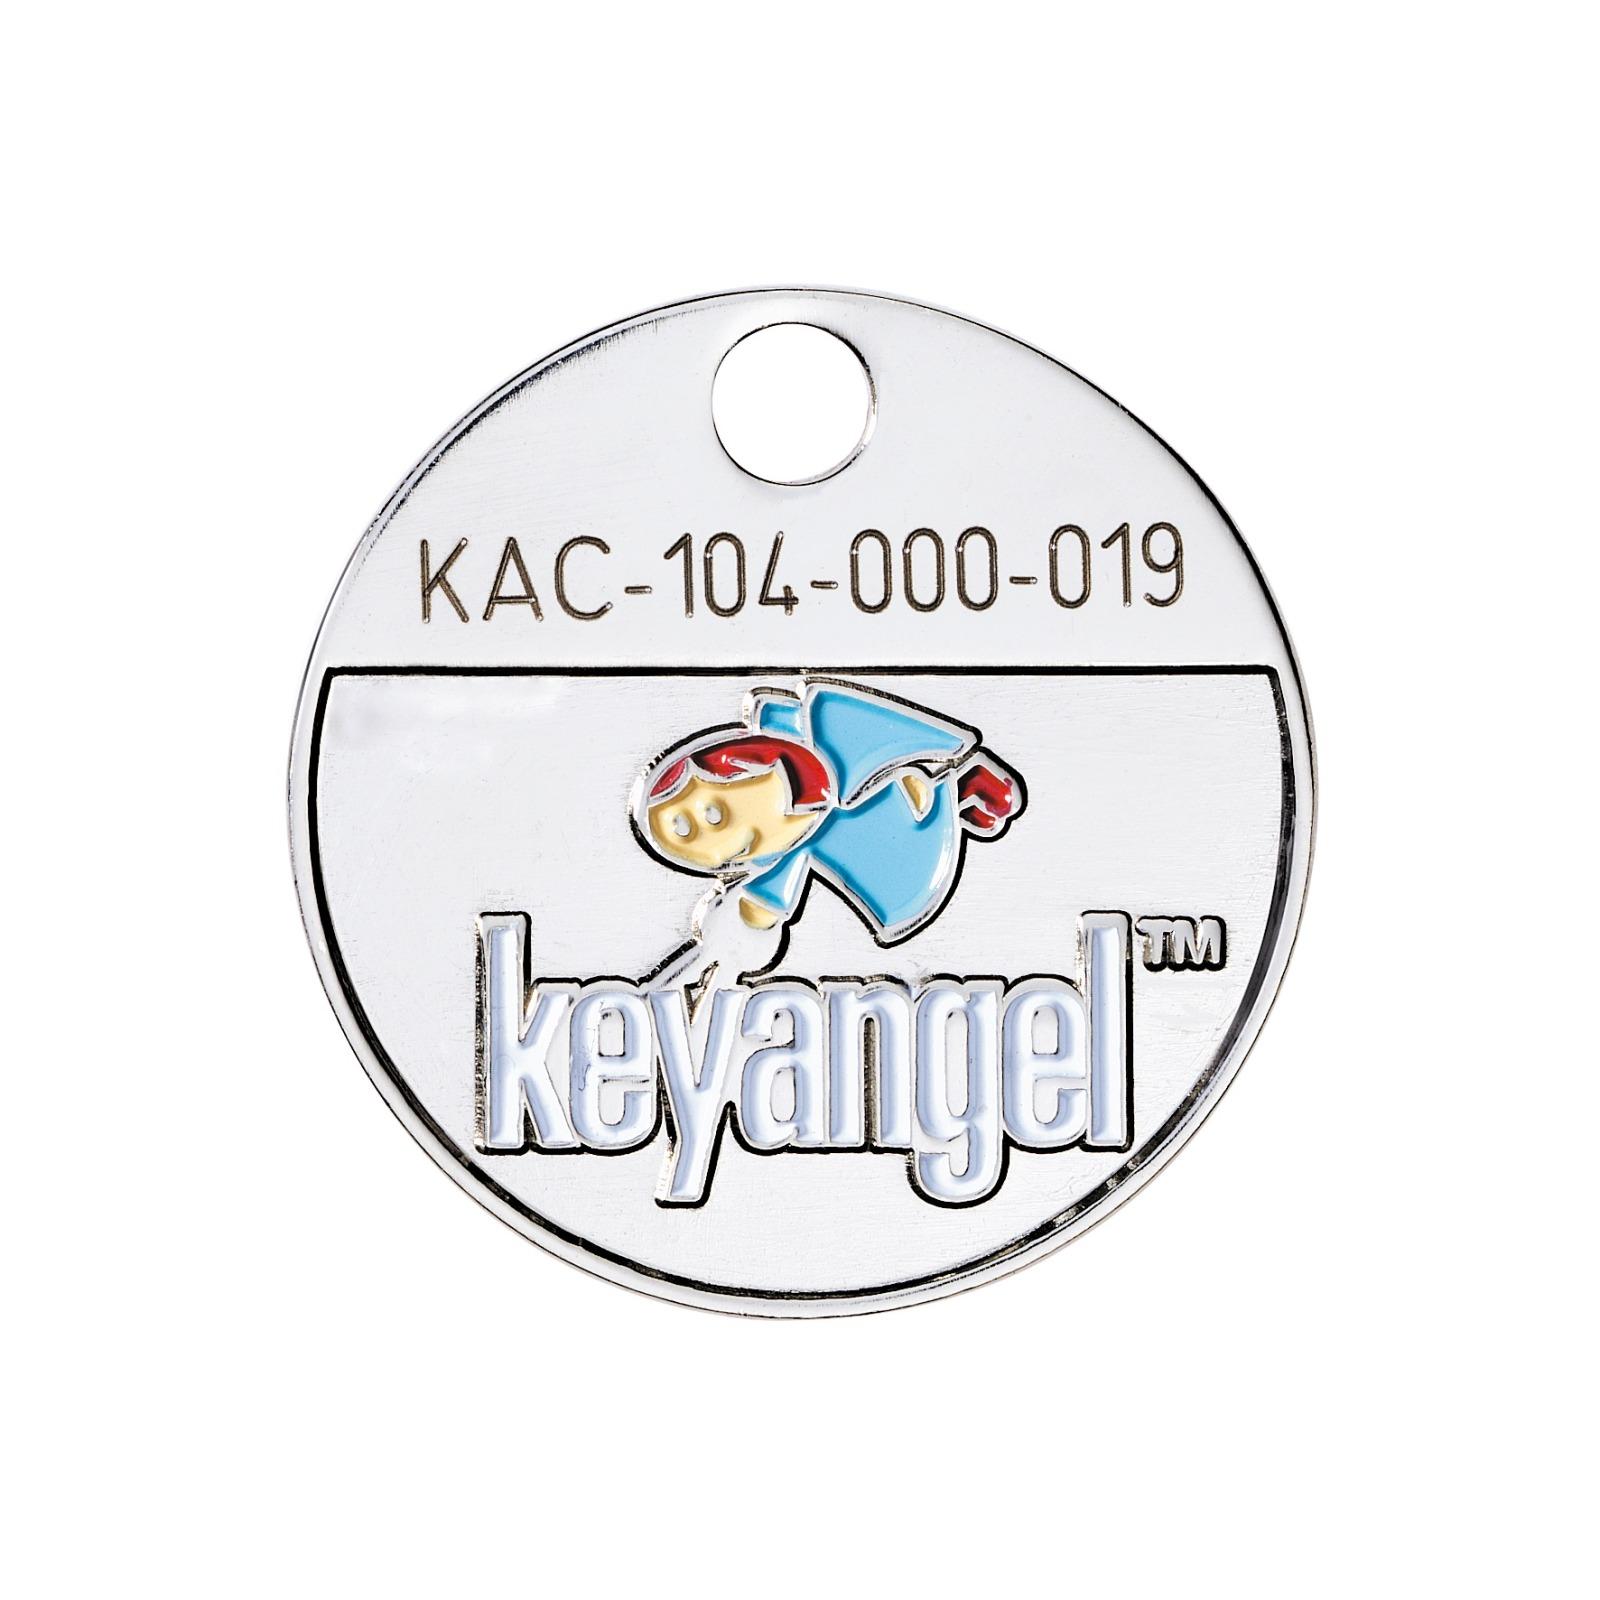 KeyAngel 10 - 2